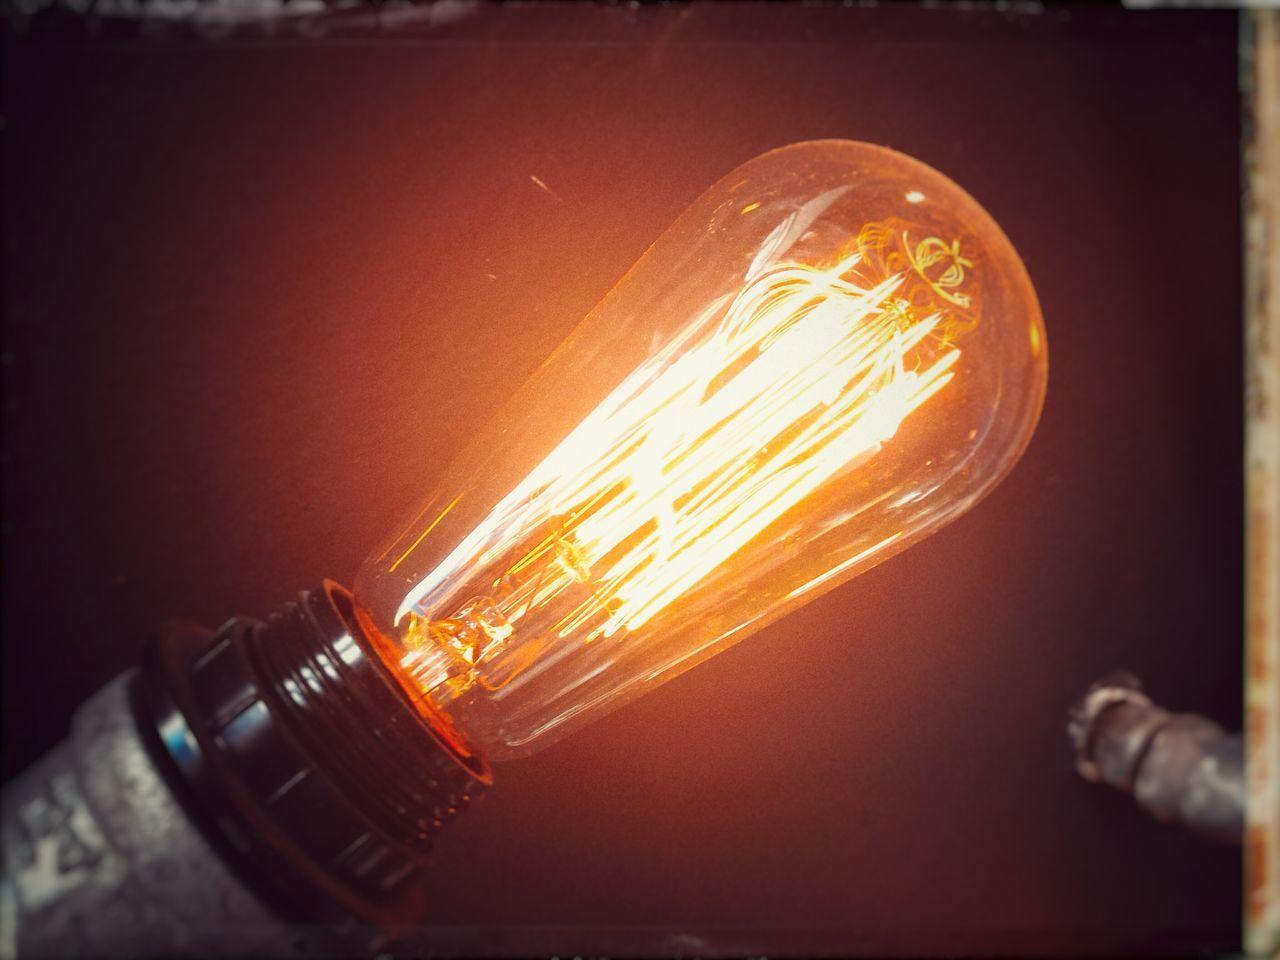 Polaroid Peeloff Alternative Process Incandescent Light Light And Shadow Light Bulb Vintage